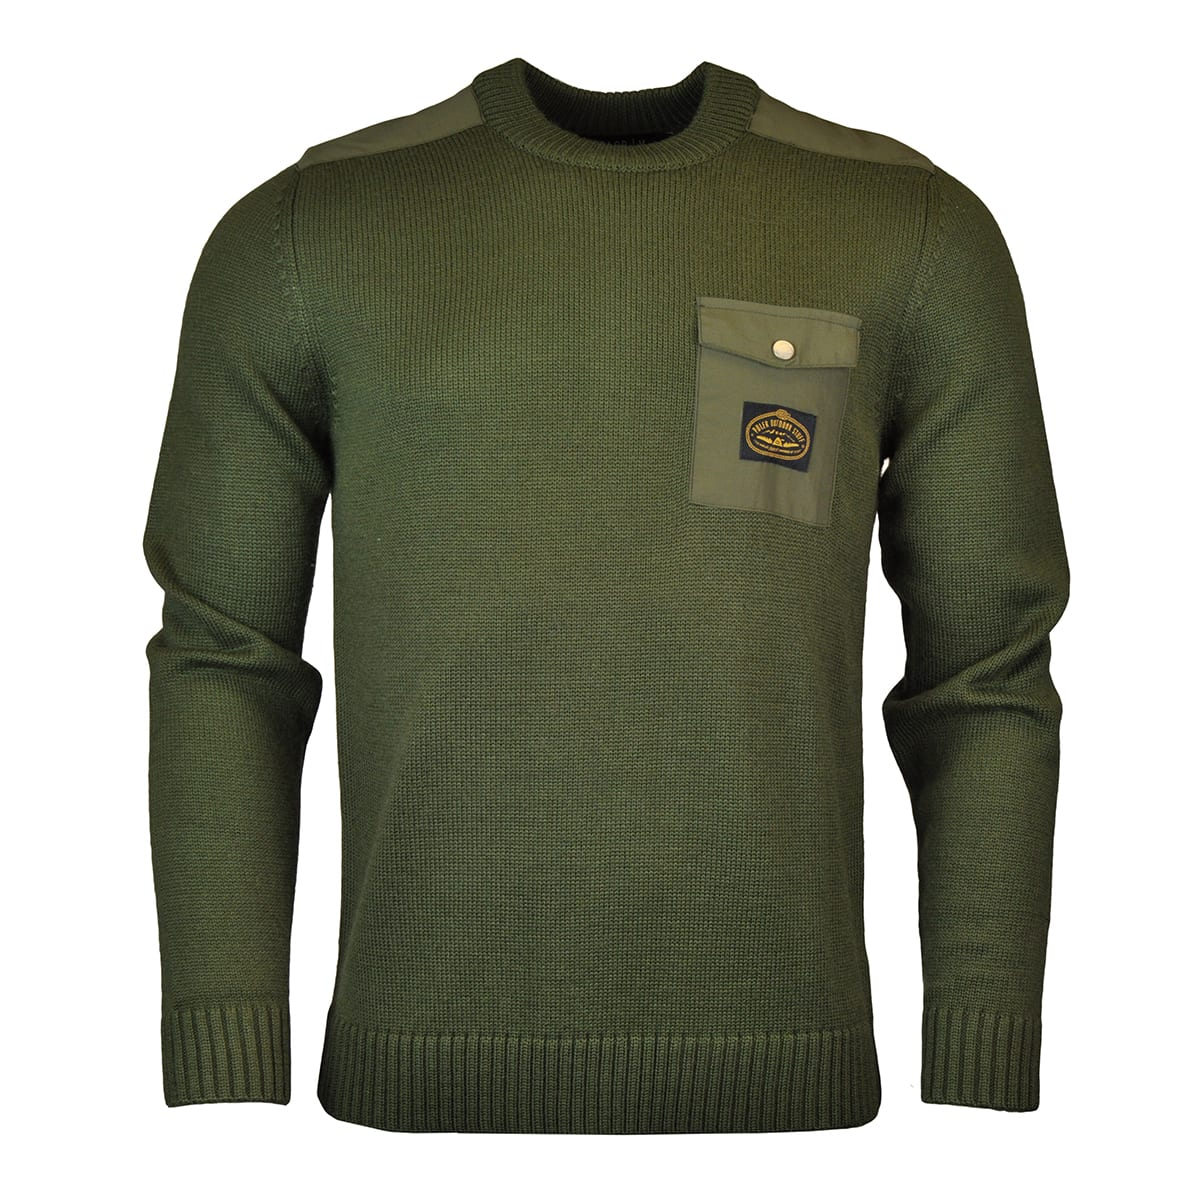 Poler Lockhart Crew Knit Olive